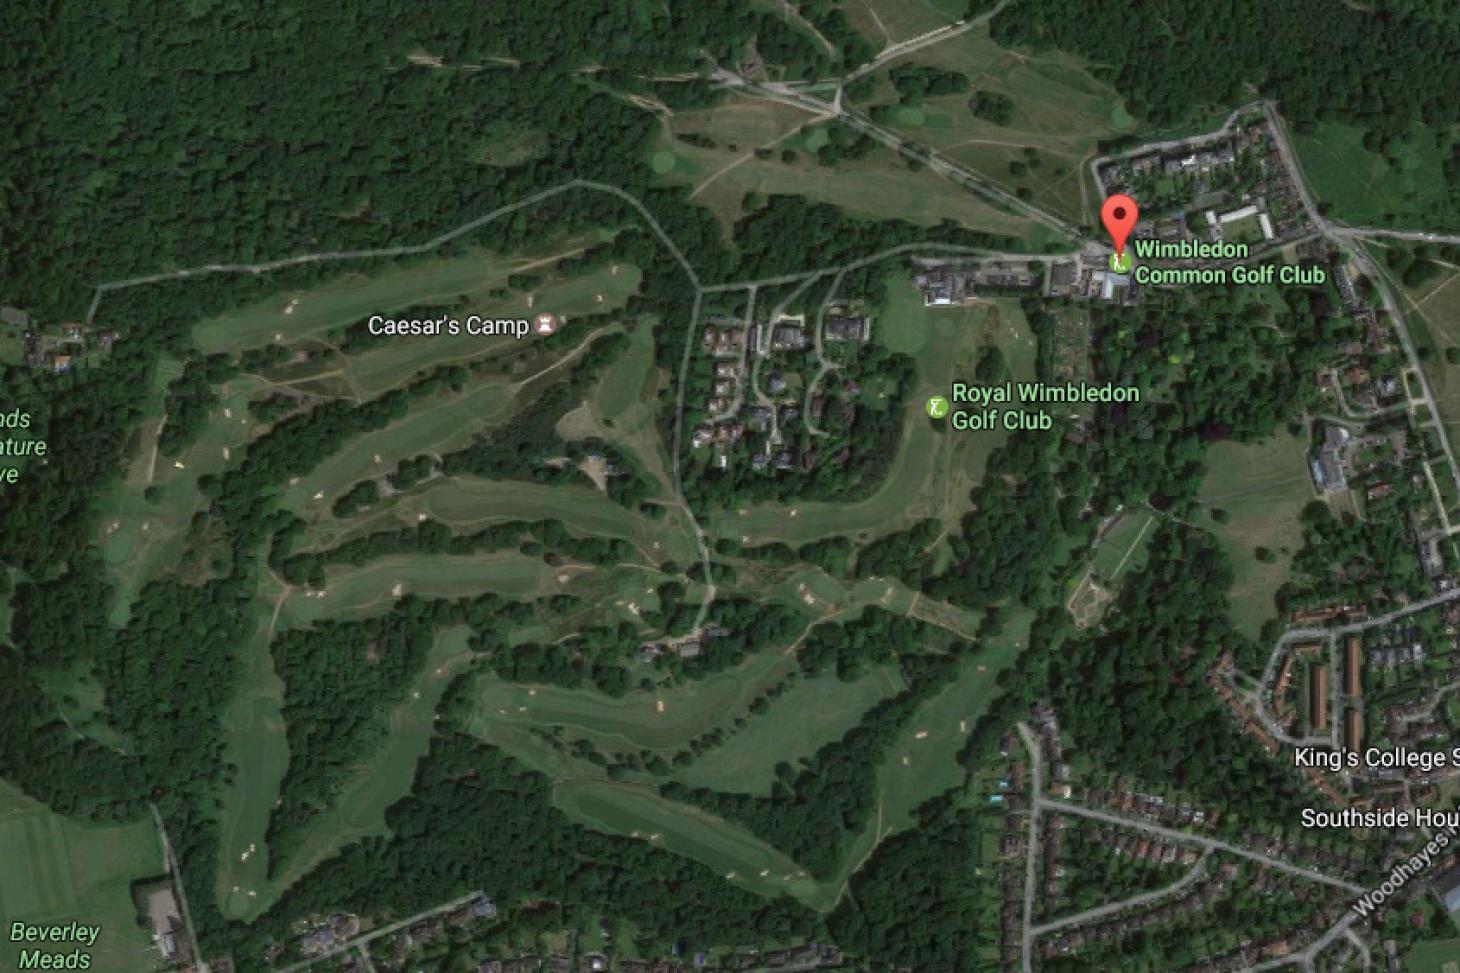 Wimbledon Common Golf Club 18 hole golf course